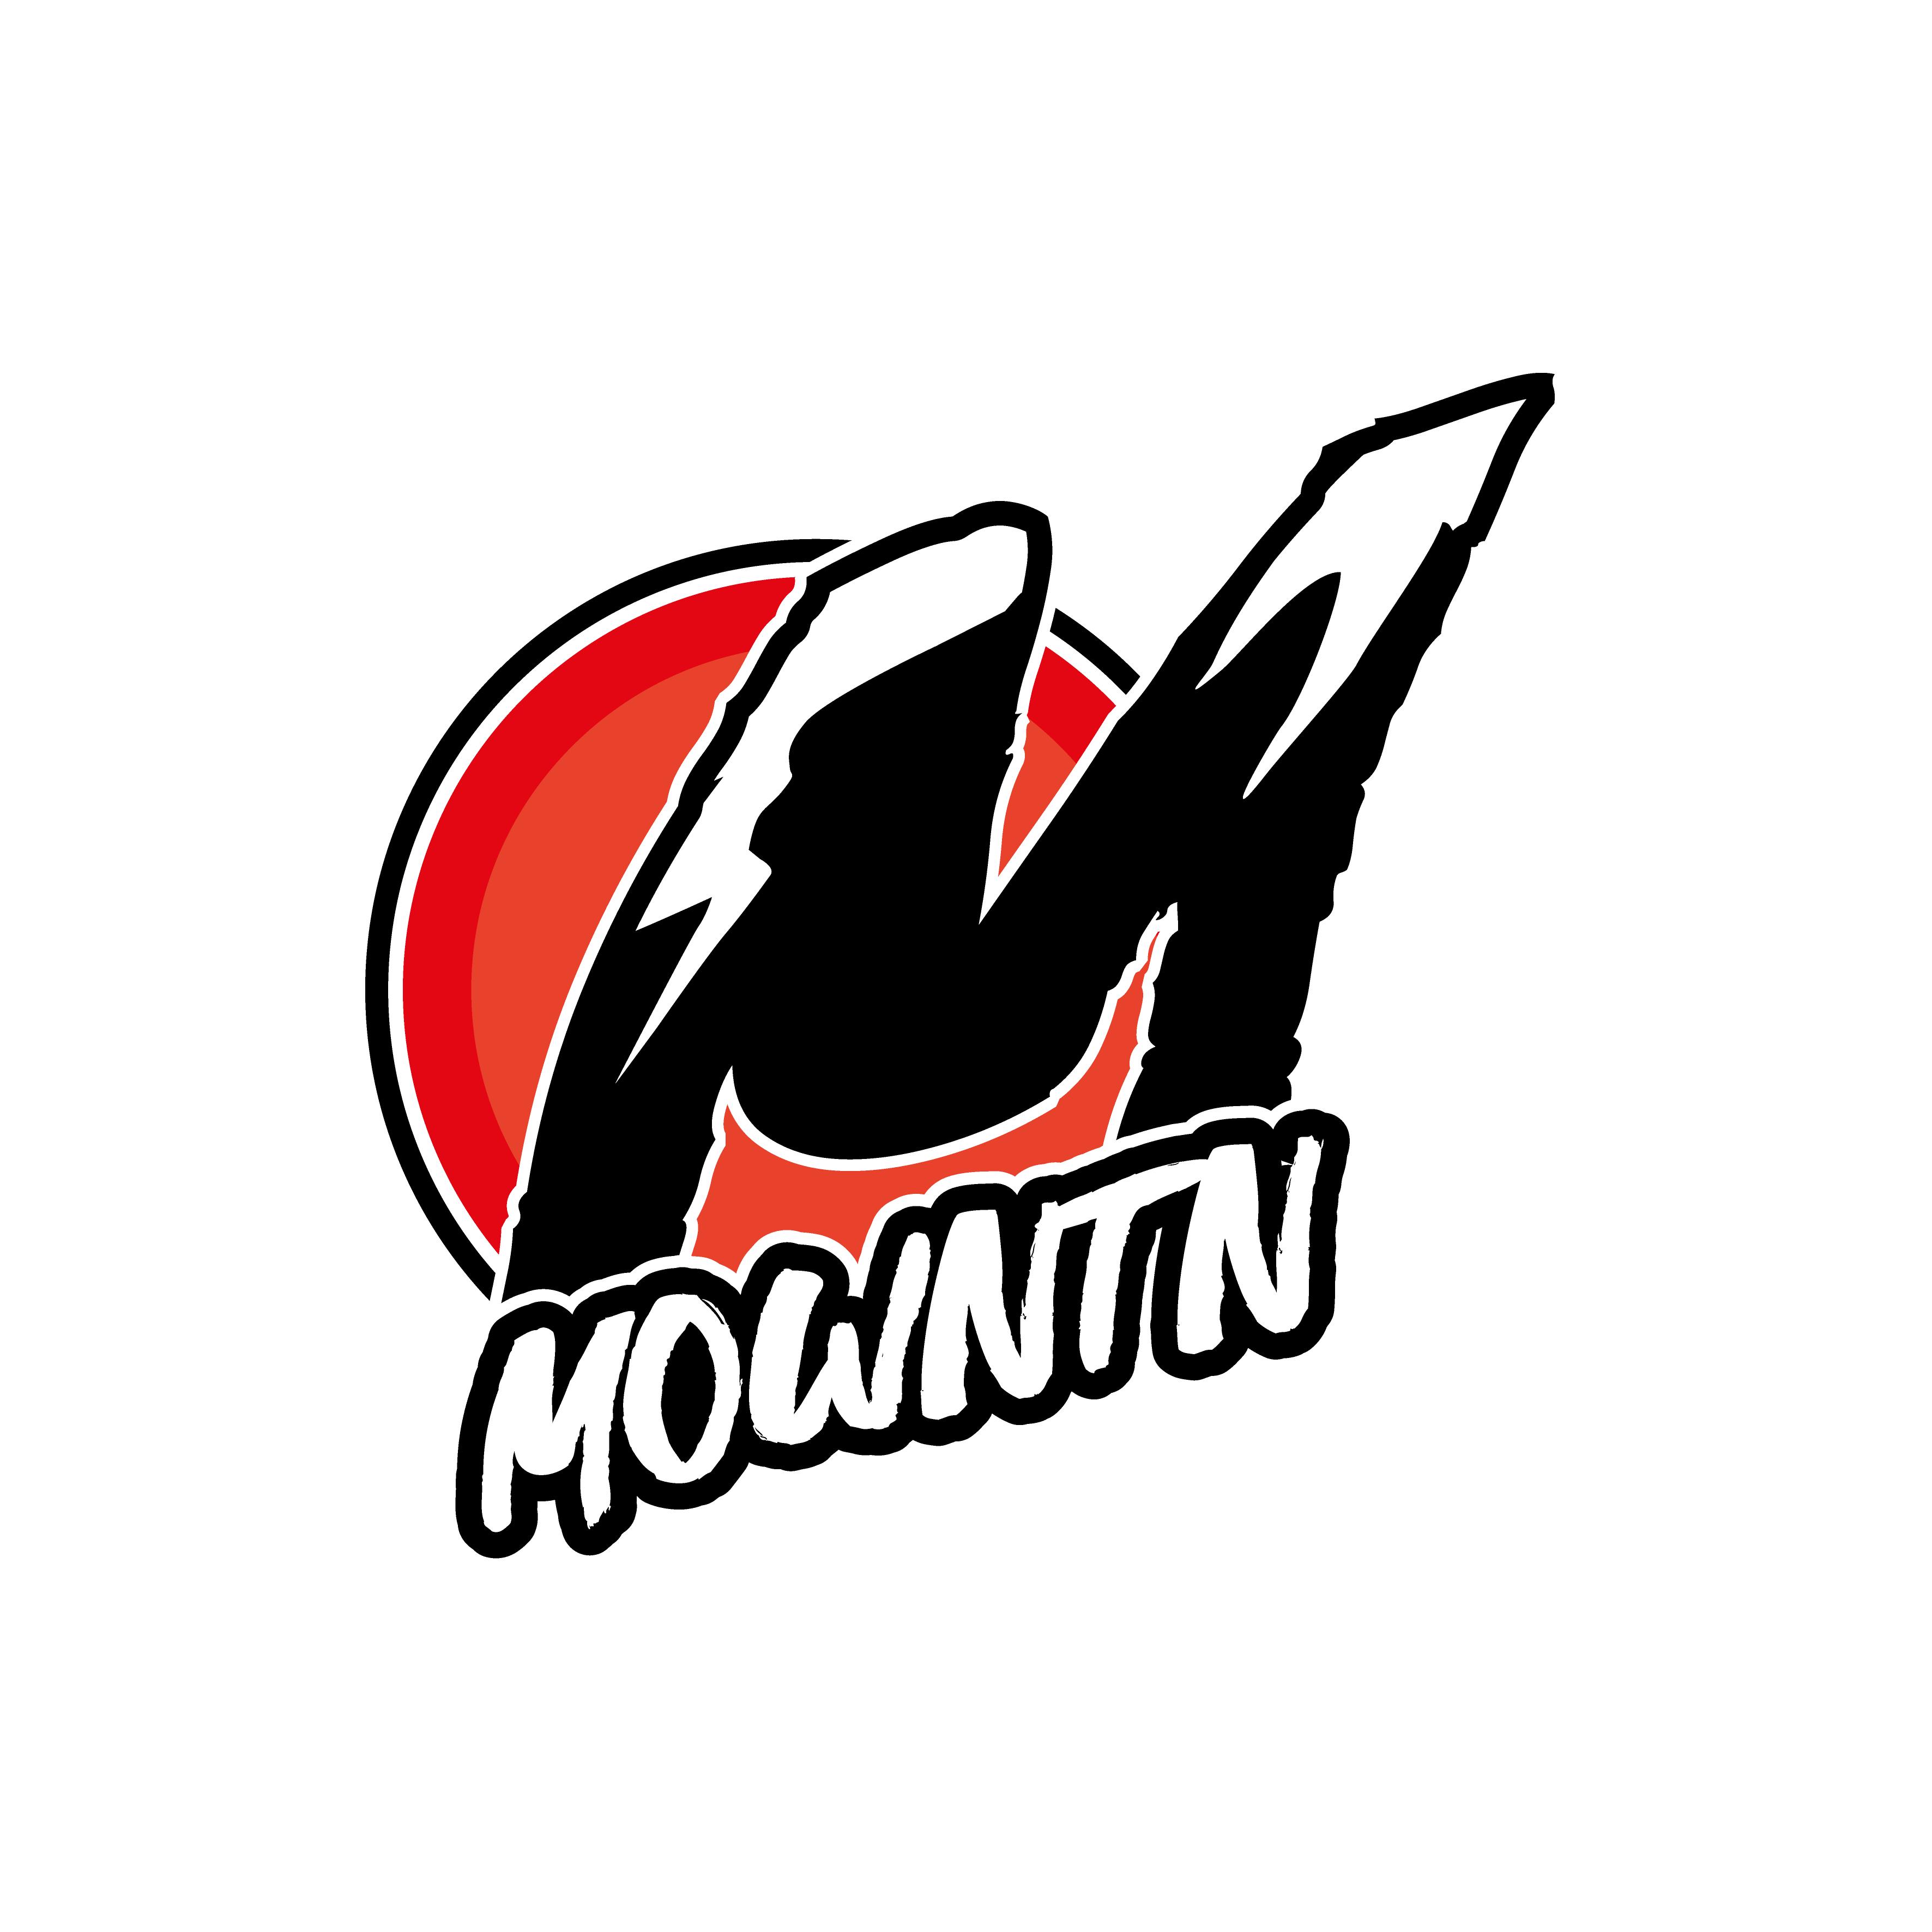 Bold Masculine Digital Marketing Logo Design For Mowntn By Ryan Orlowski Design 22462318